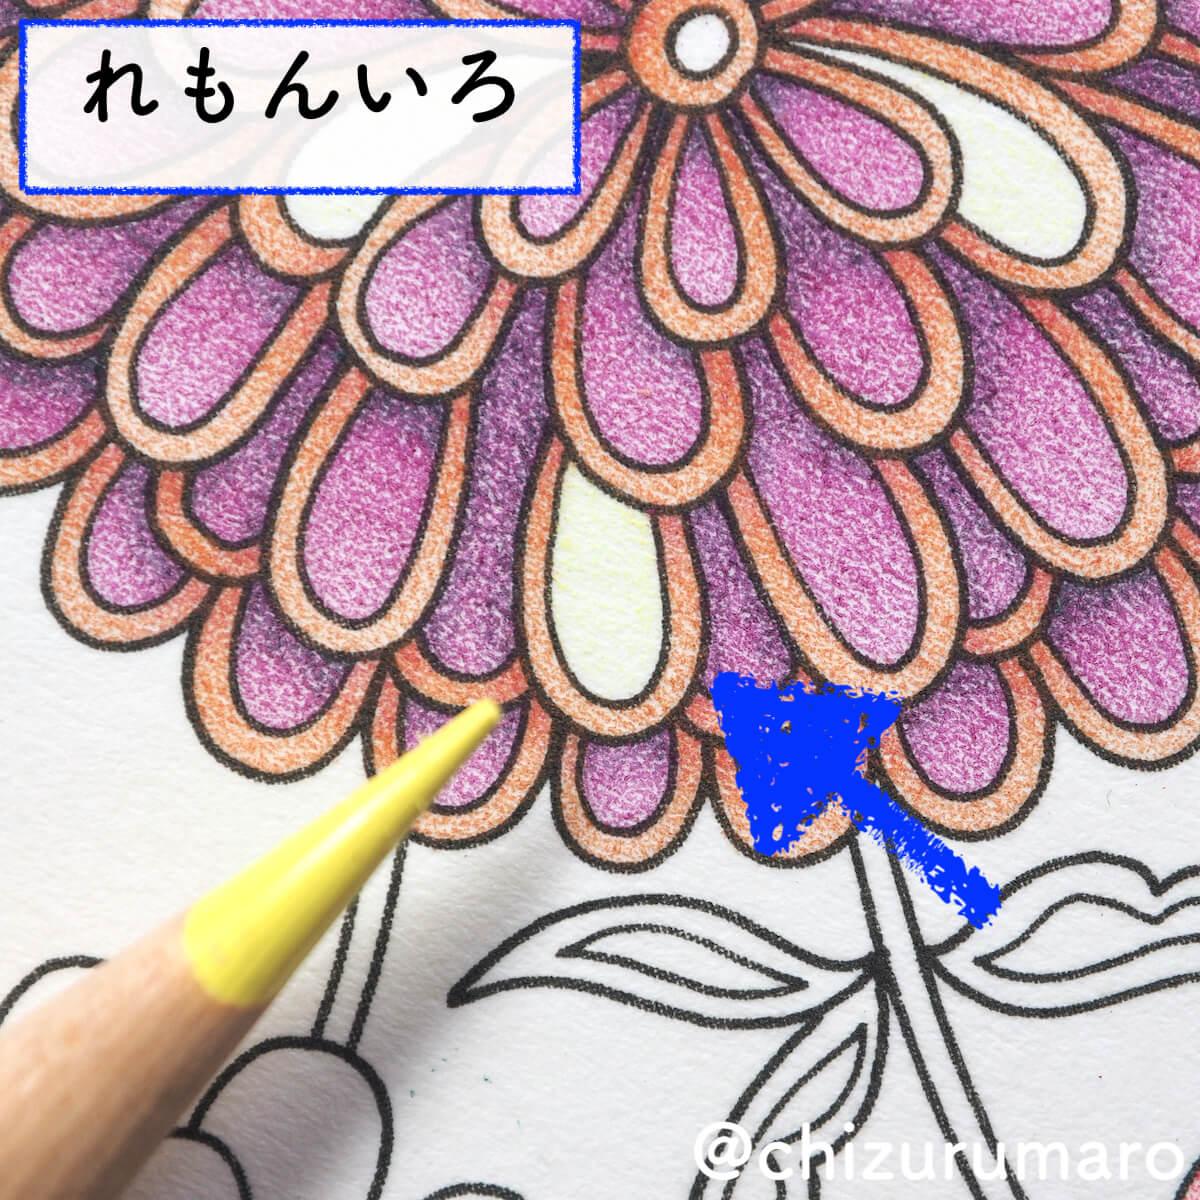 f:id:chizurumaro:20200422153123j:plain